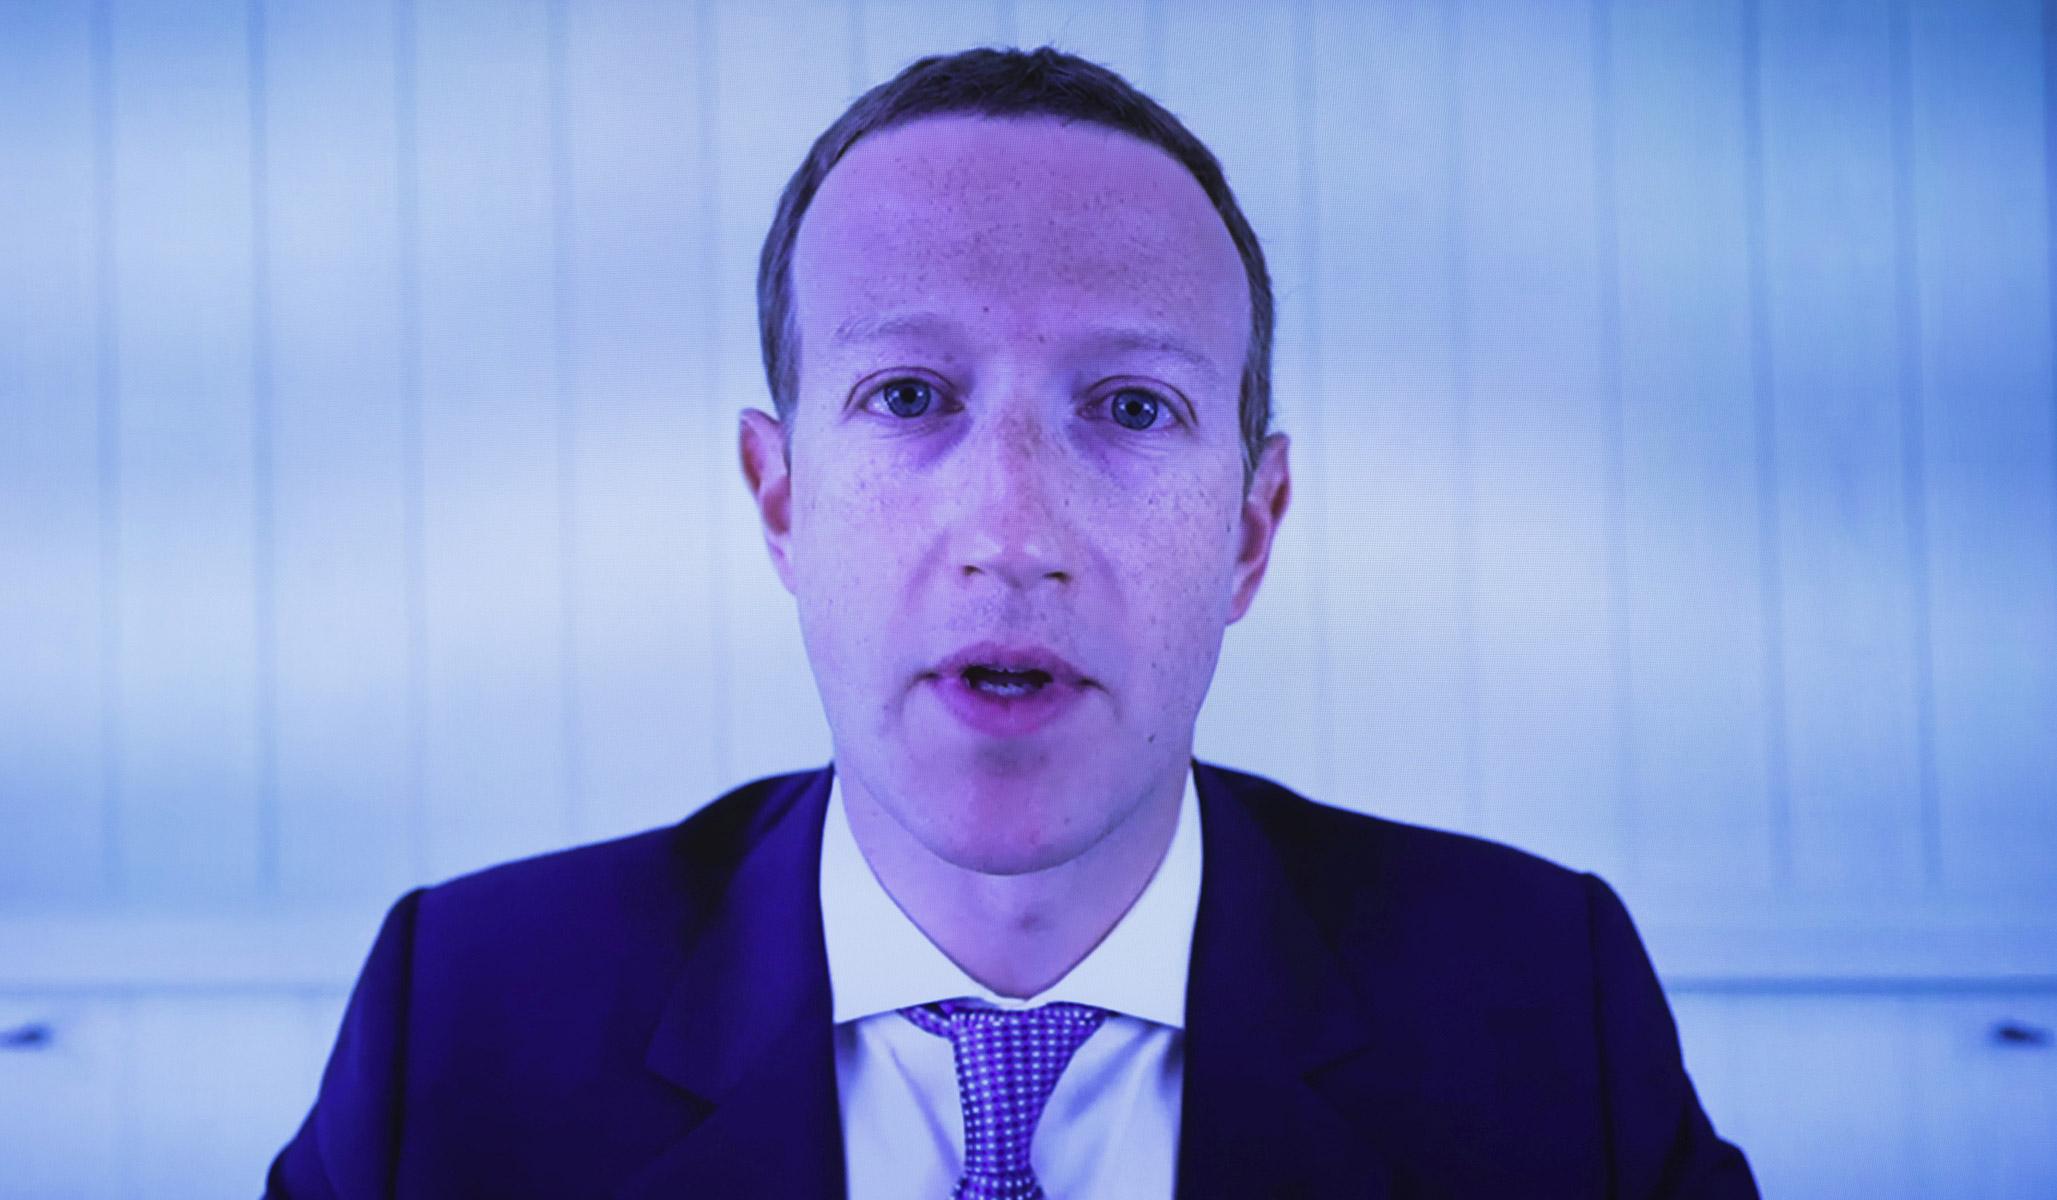 Mark Zuckerberg Continues Facebook's Turn against China thumbnail